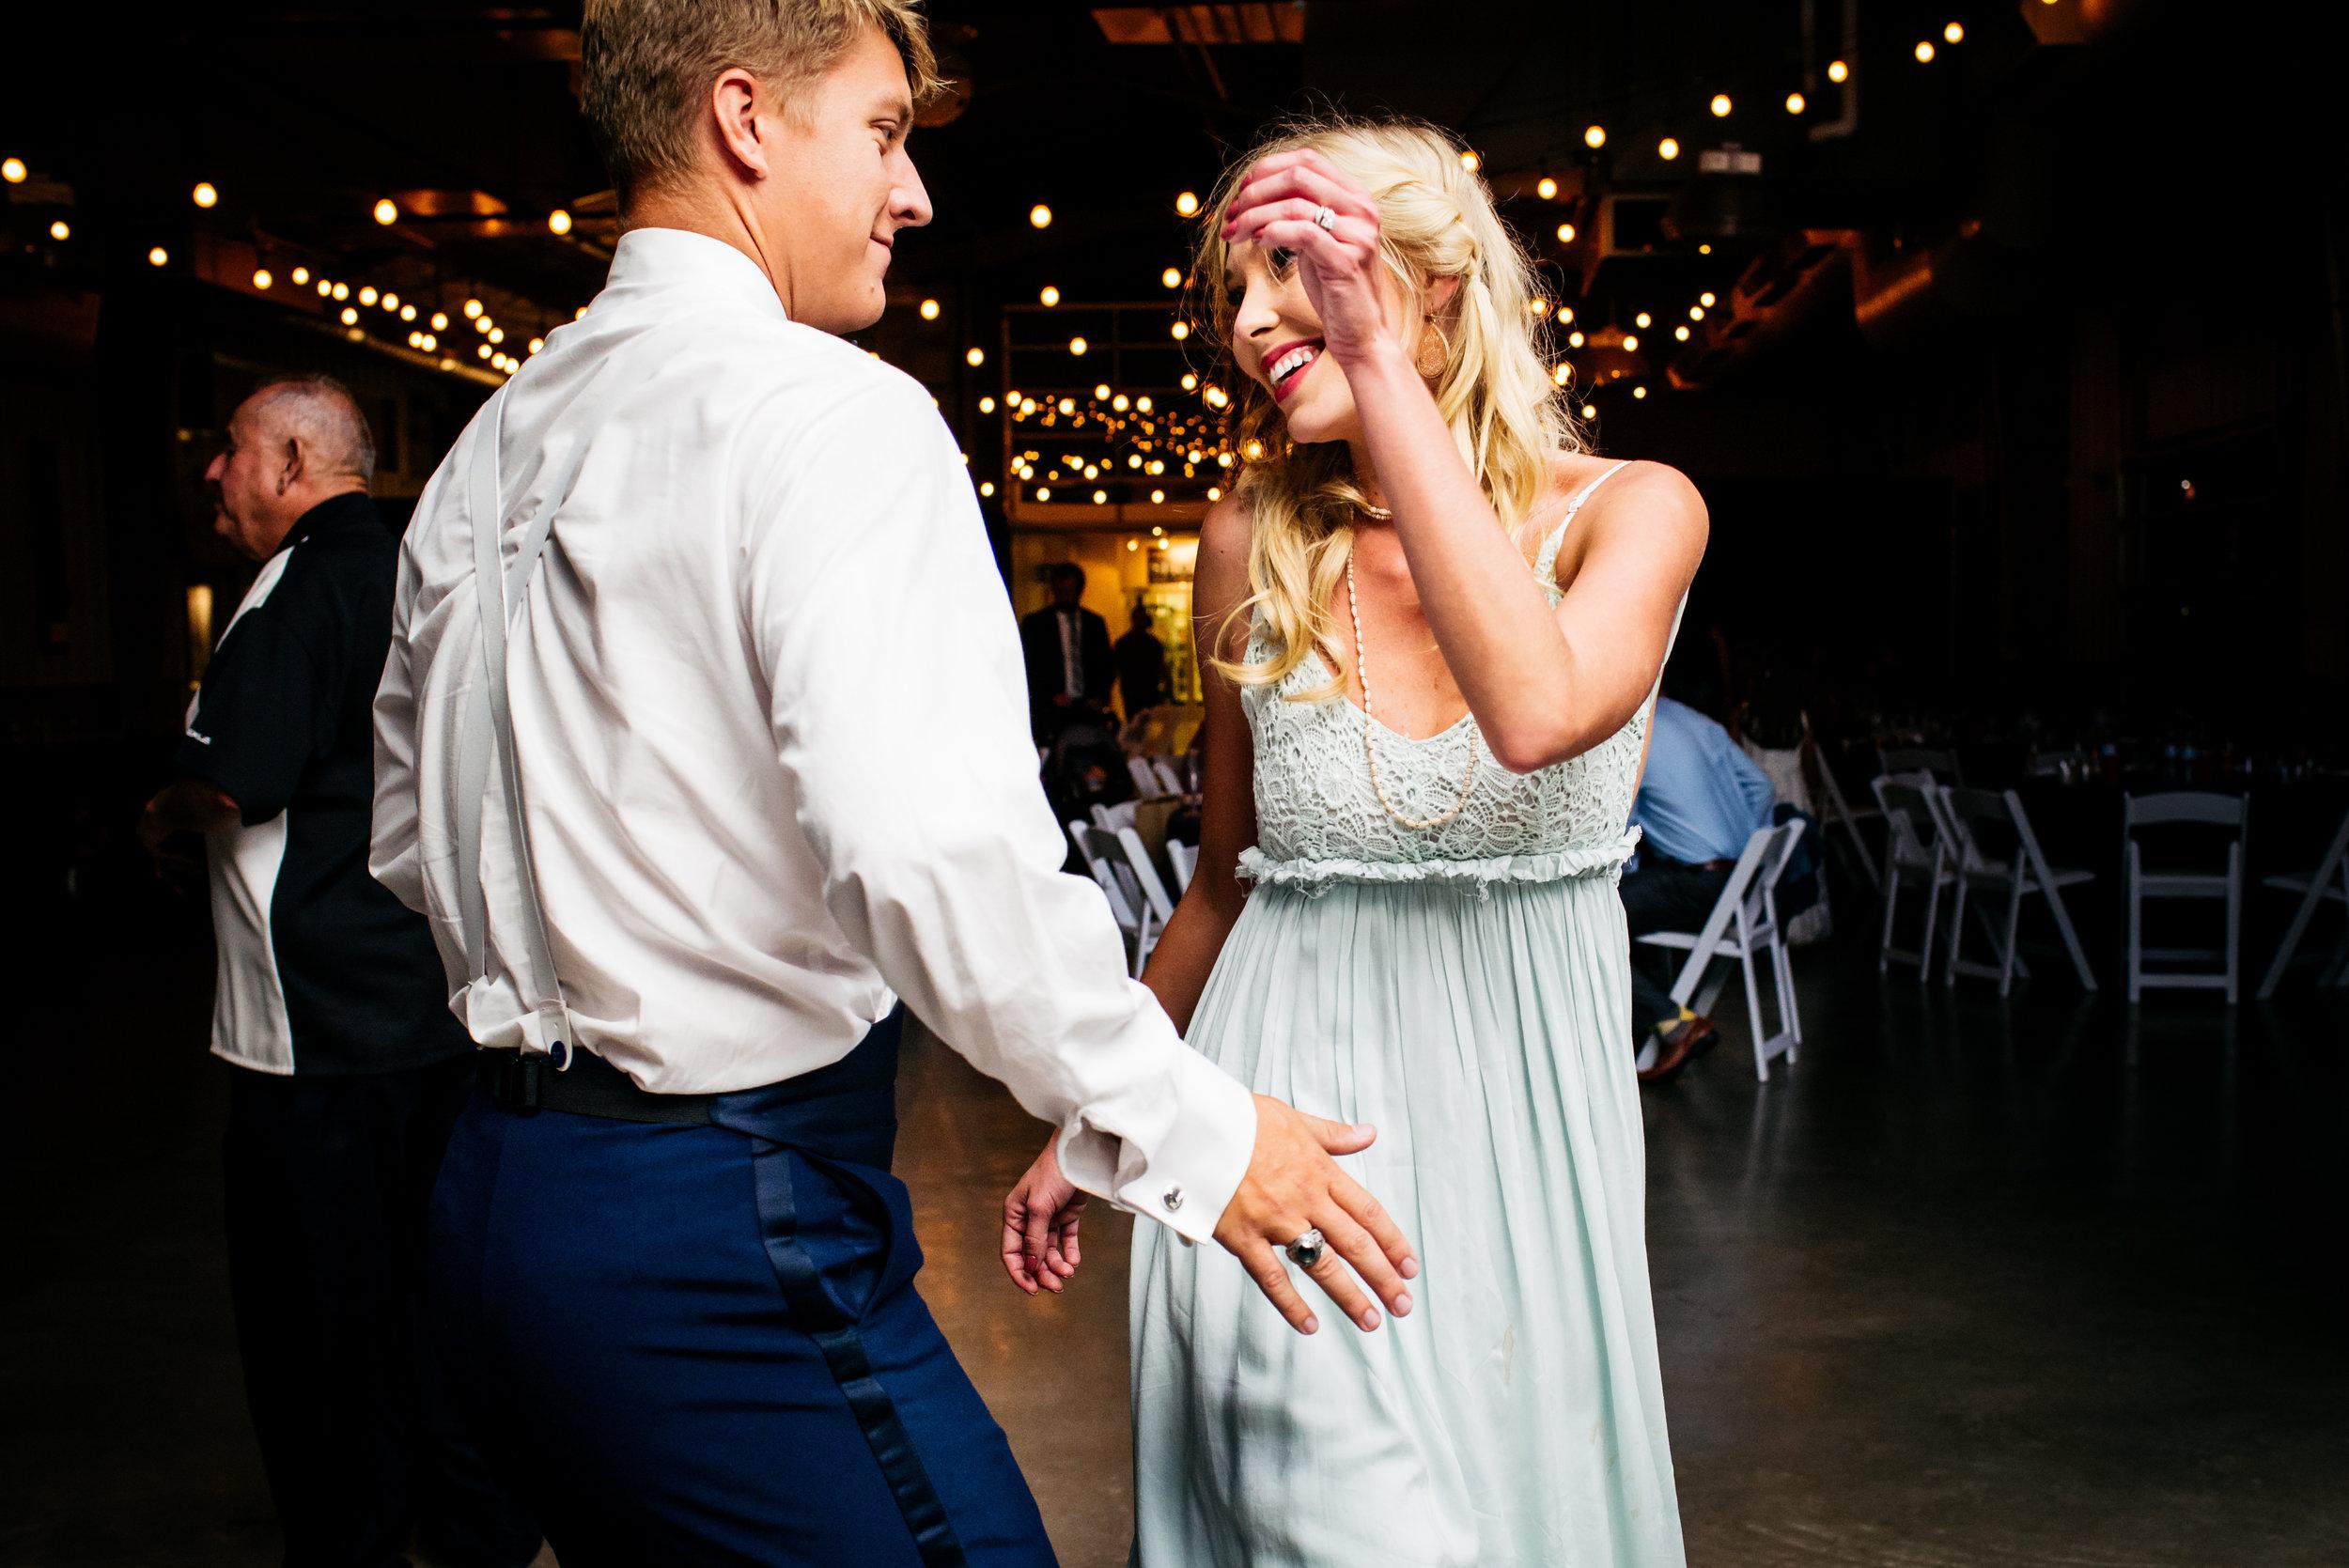 Santa Fe Railyards Wedding Extended Play Photography-23.jpg